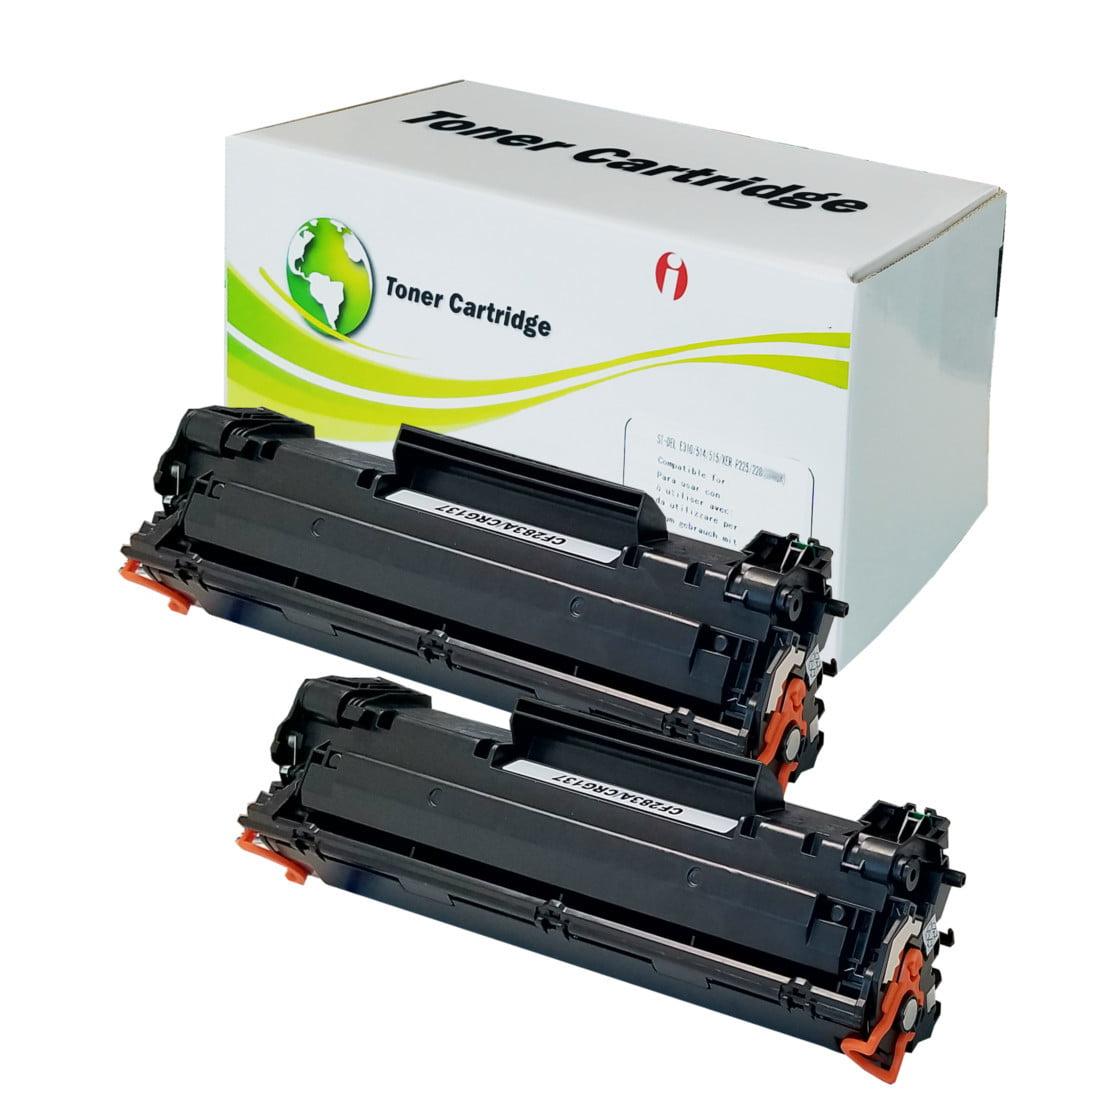 Mfp Printers